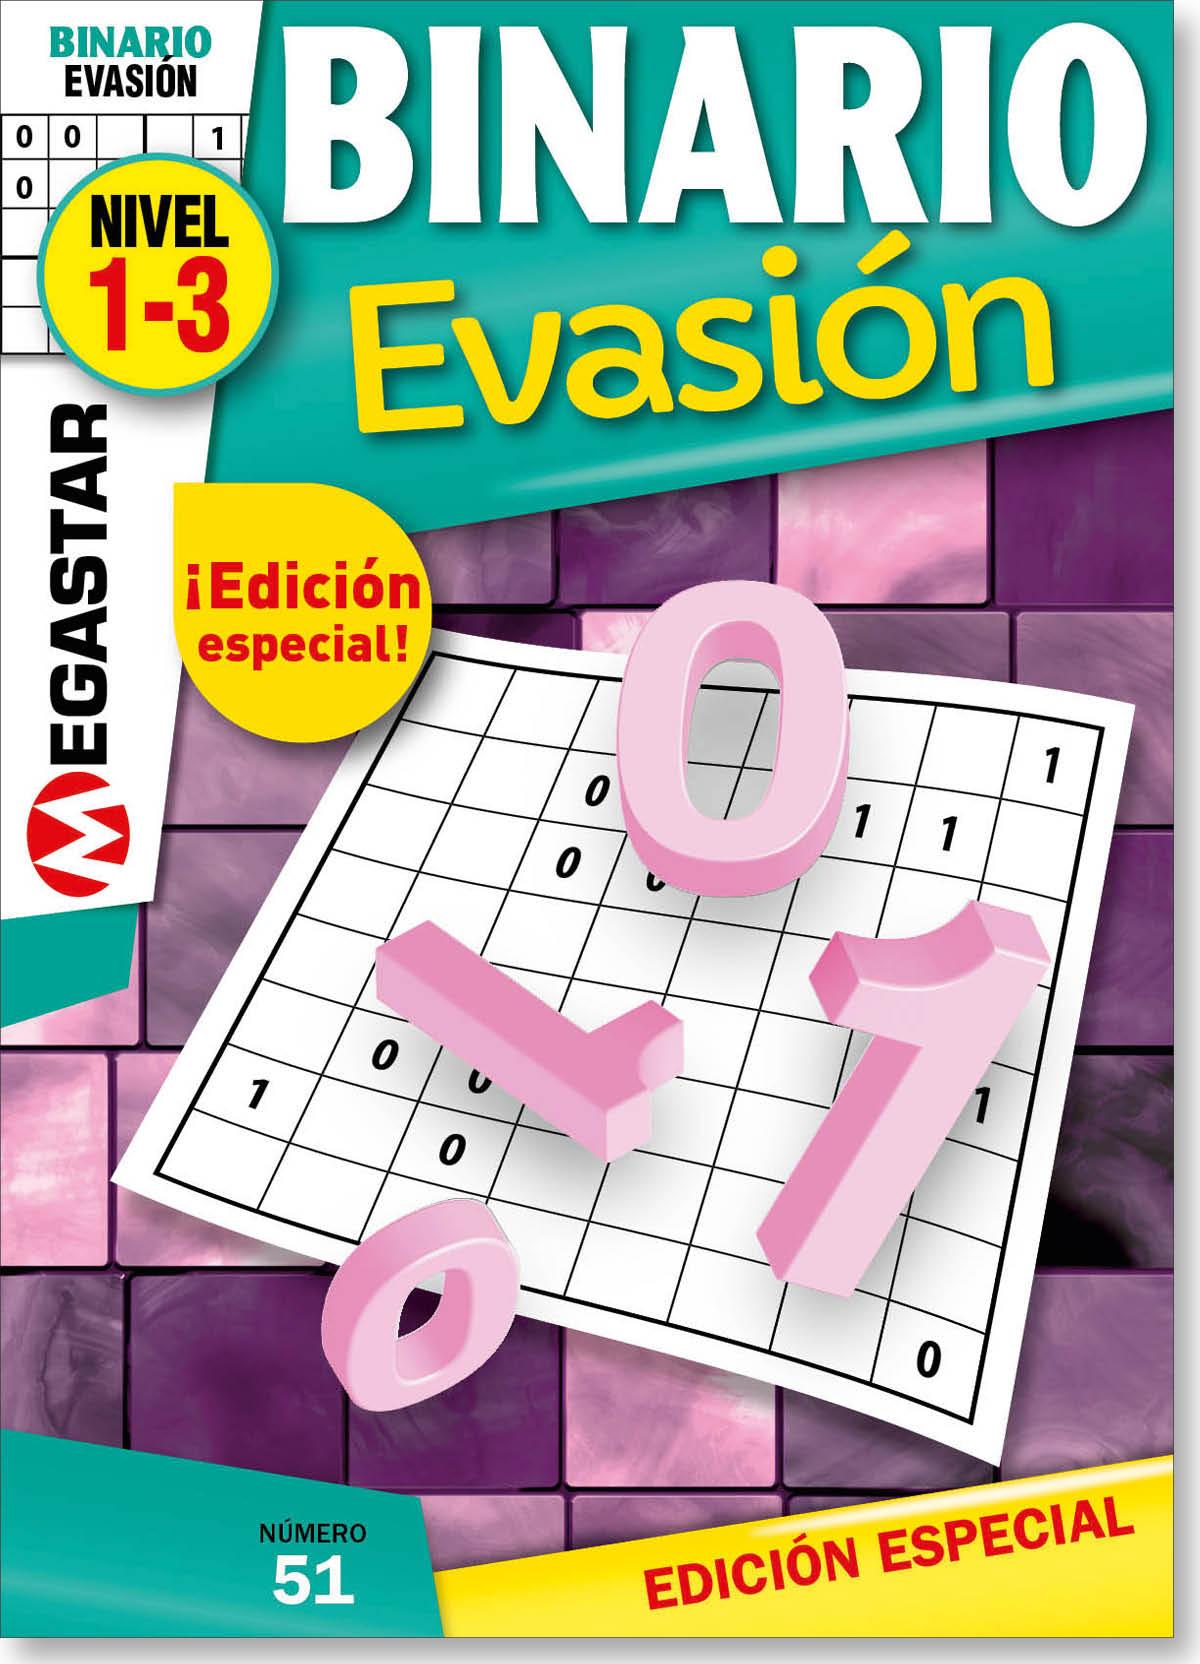 Binario Evasión Nivel 1-3